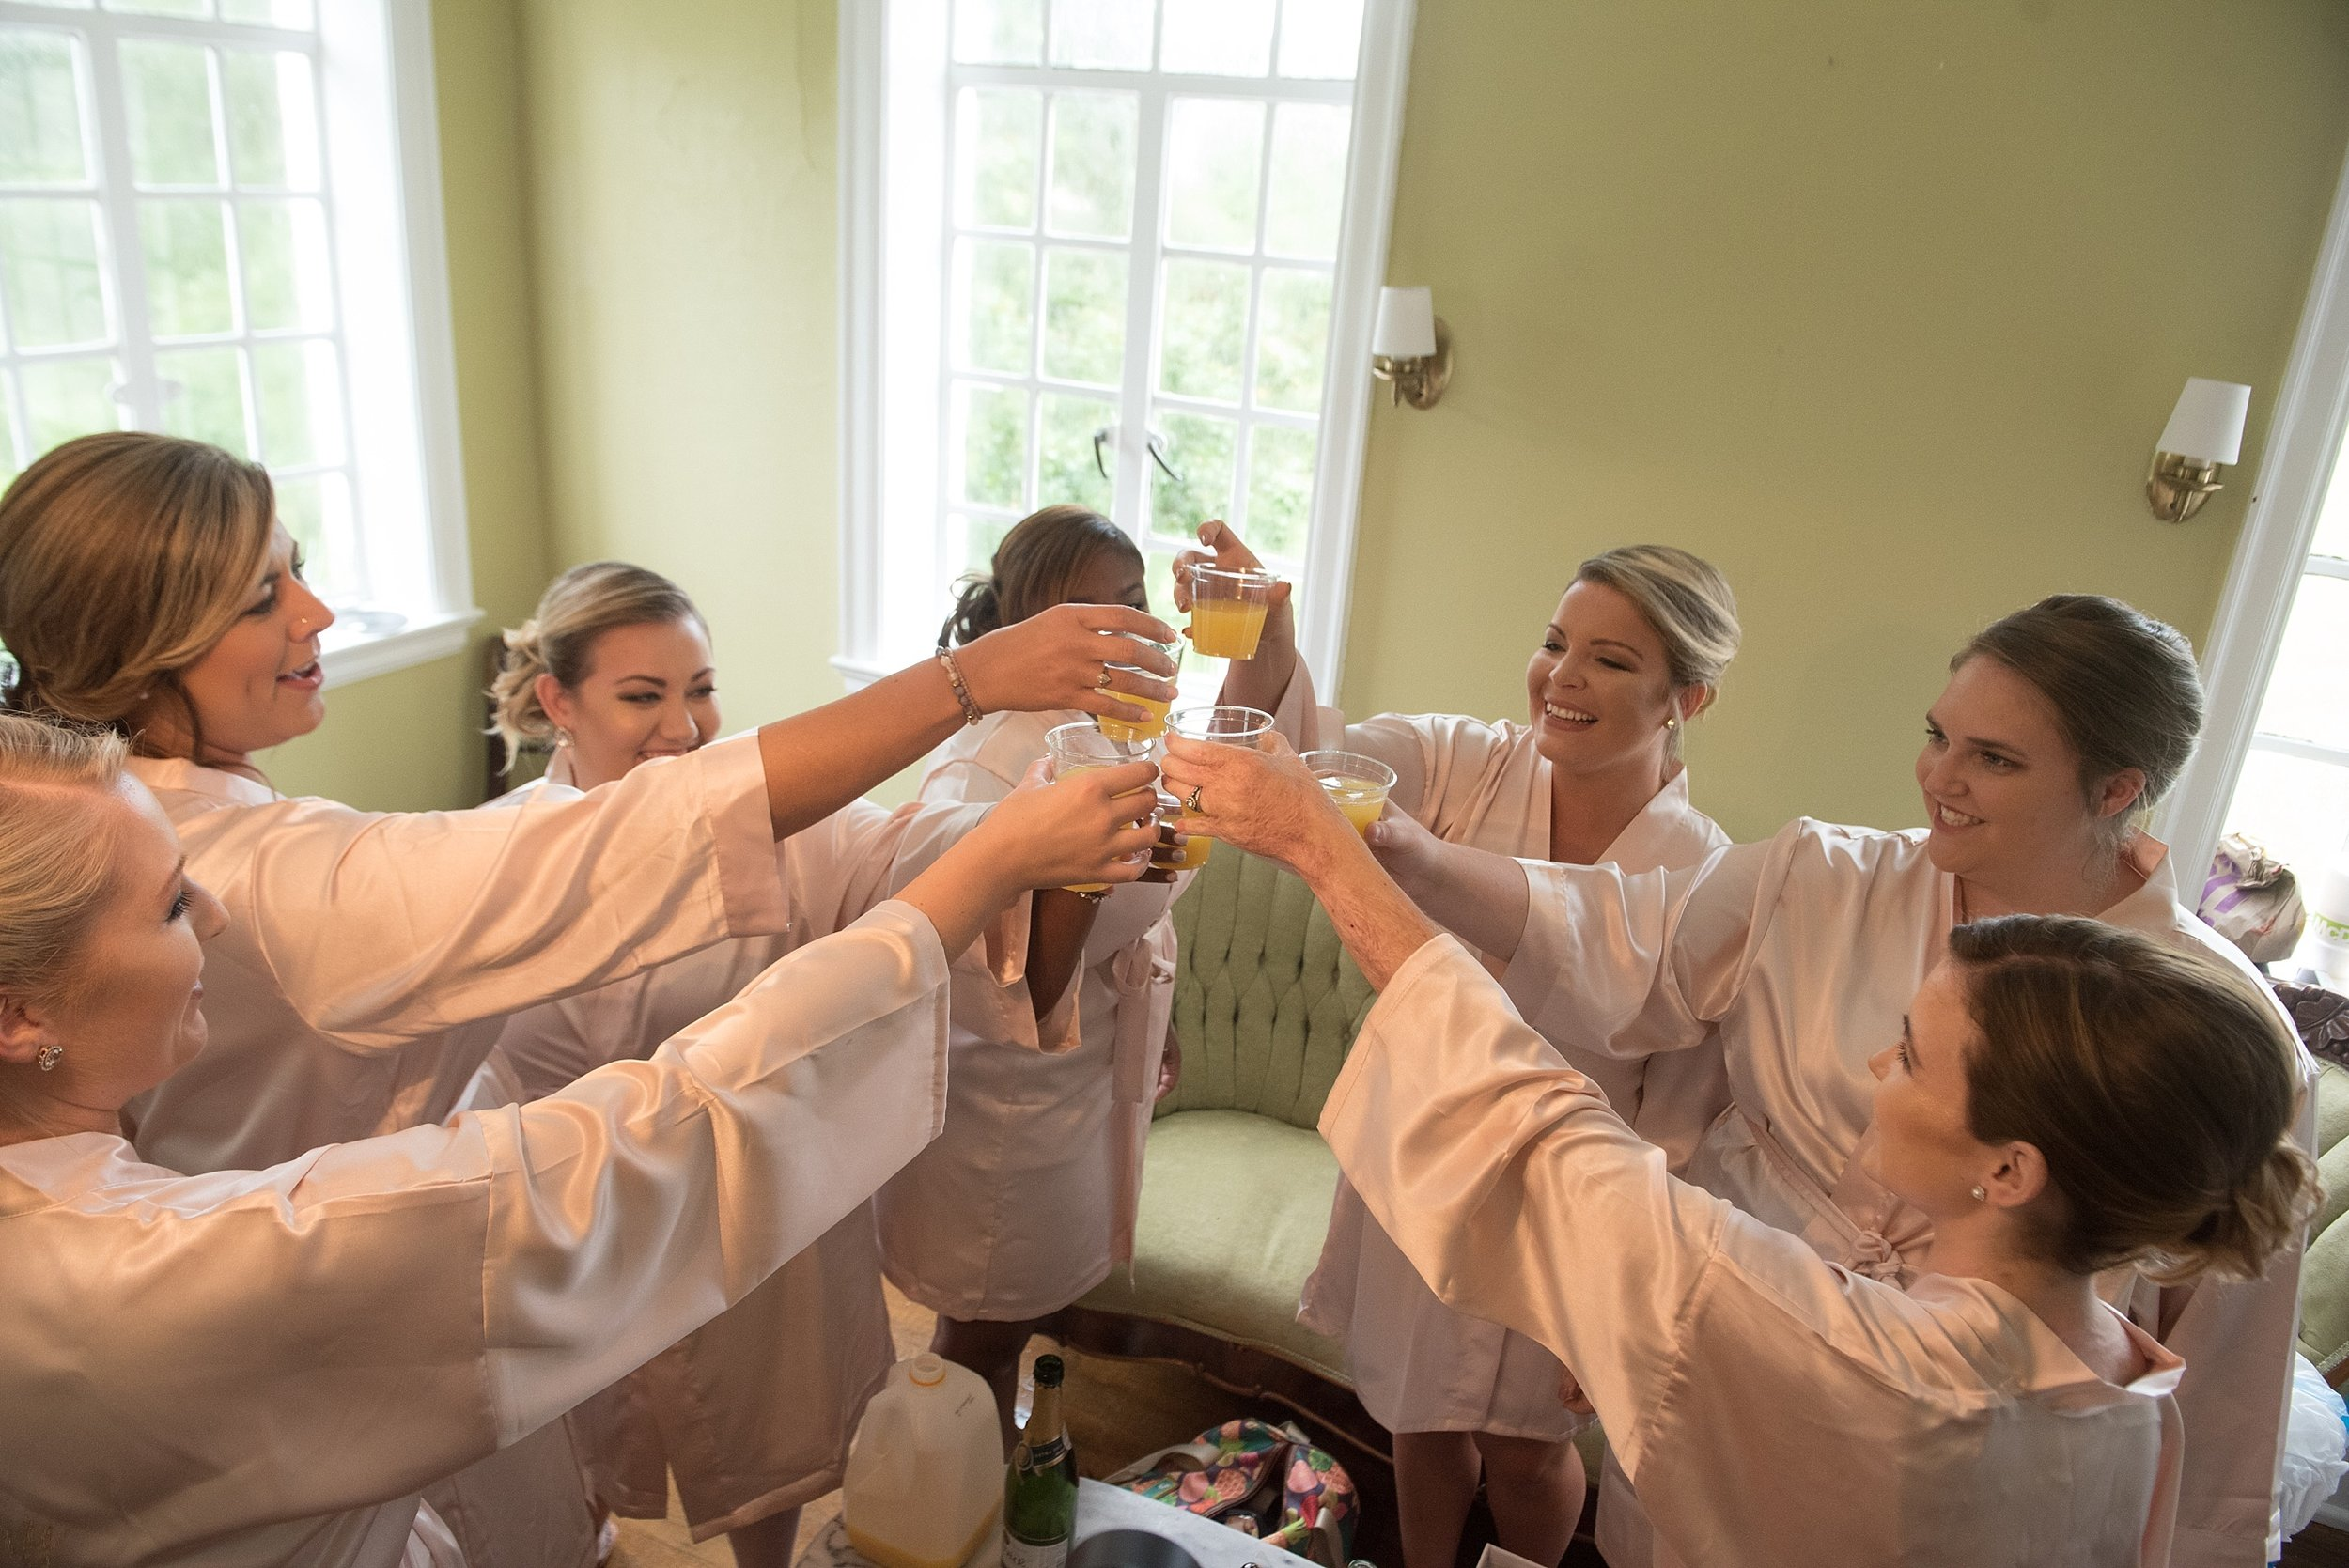 Bridesmaids make a toast to the bride